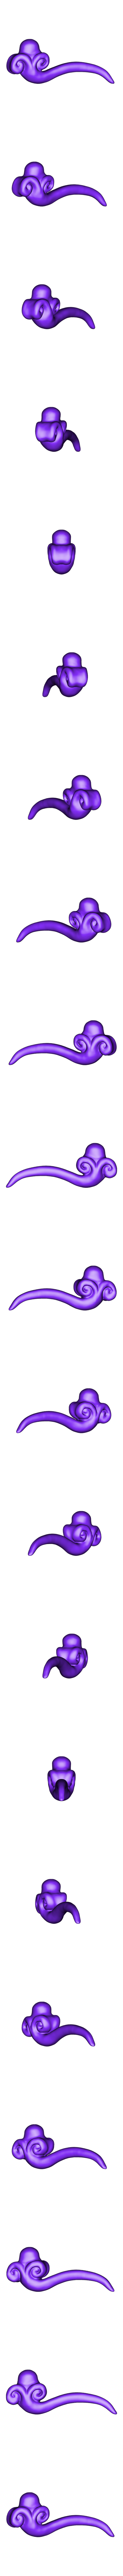 Cloud_011.stl Download STL file Asian Cloud n°11 • 3D printing object, LeKid